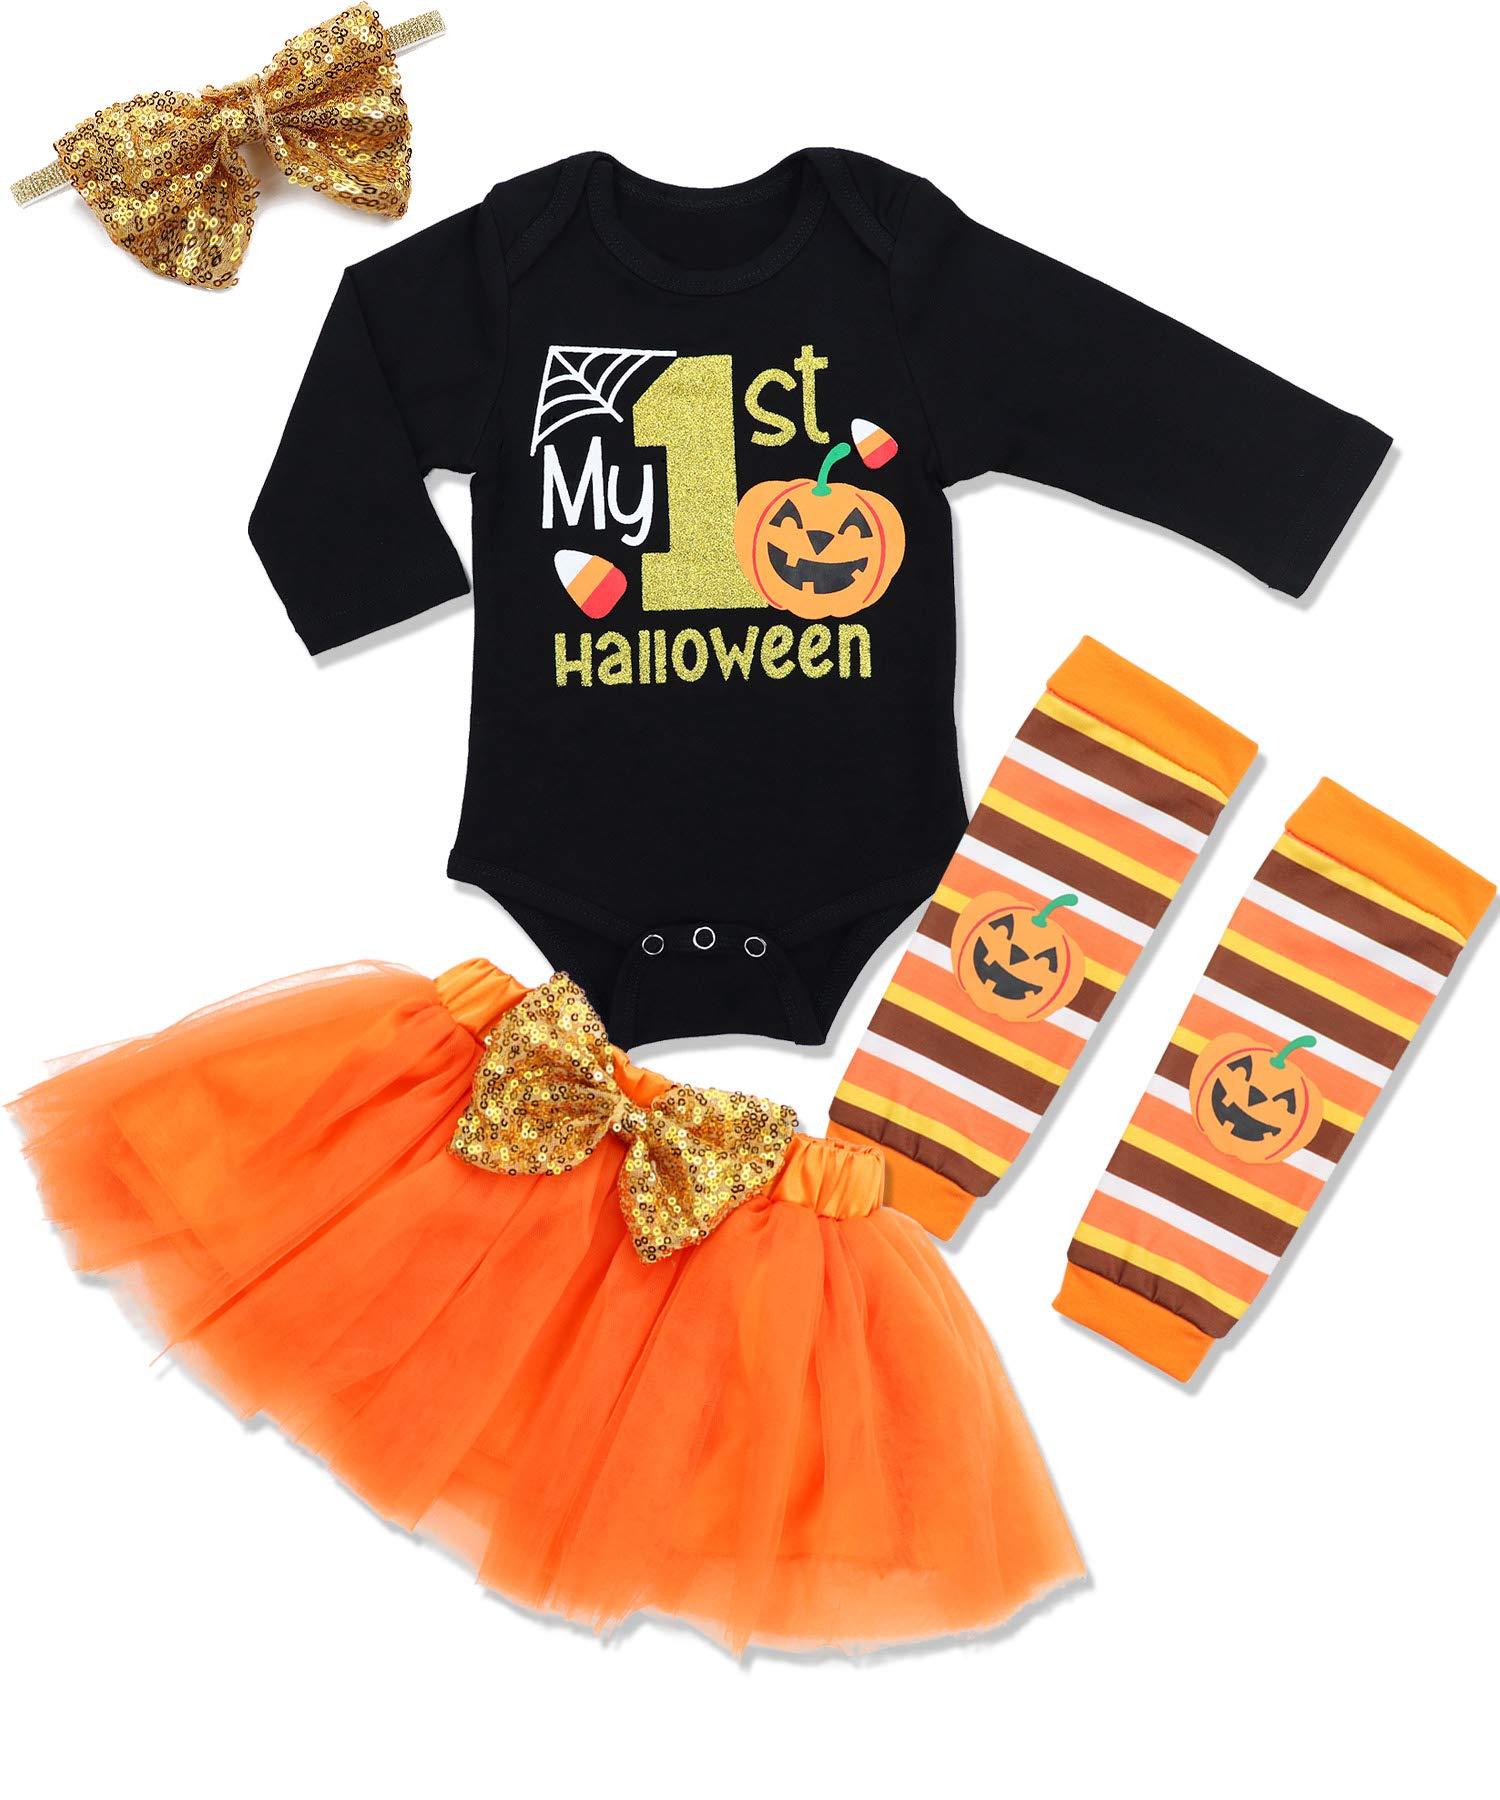 Baby Girl First Halloween Tutu Dress Outfit My 1st Halloween Romper + Leg Warmers + Headband+Tutu Dress Clothing Set